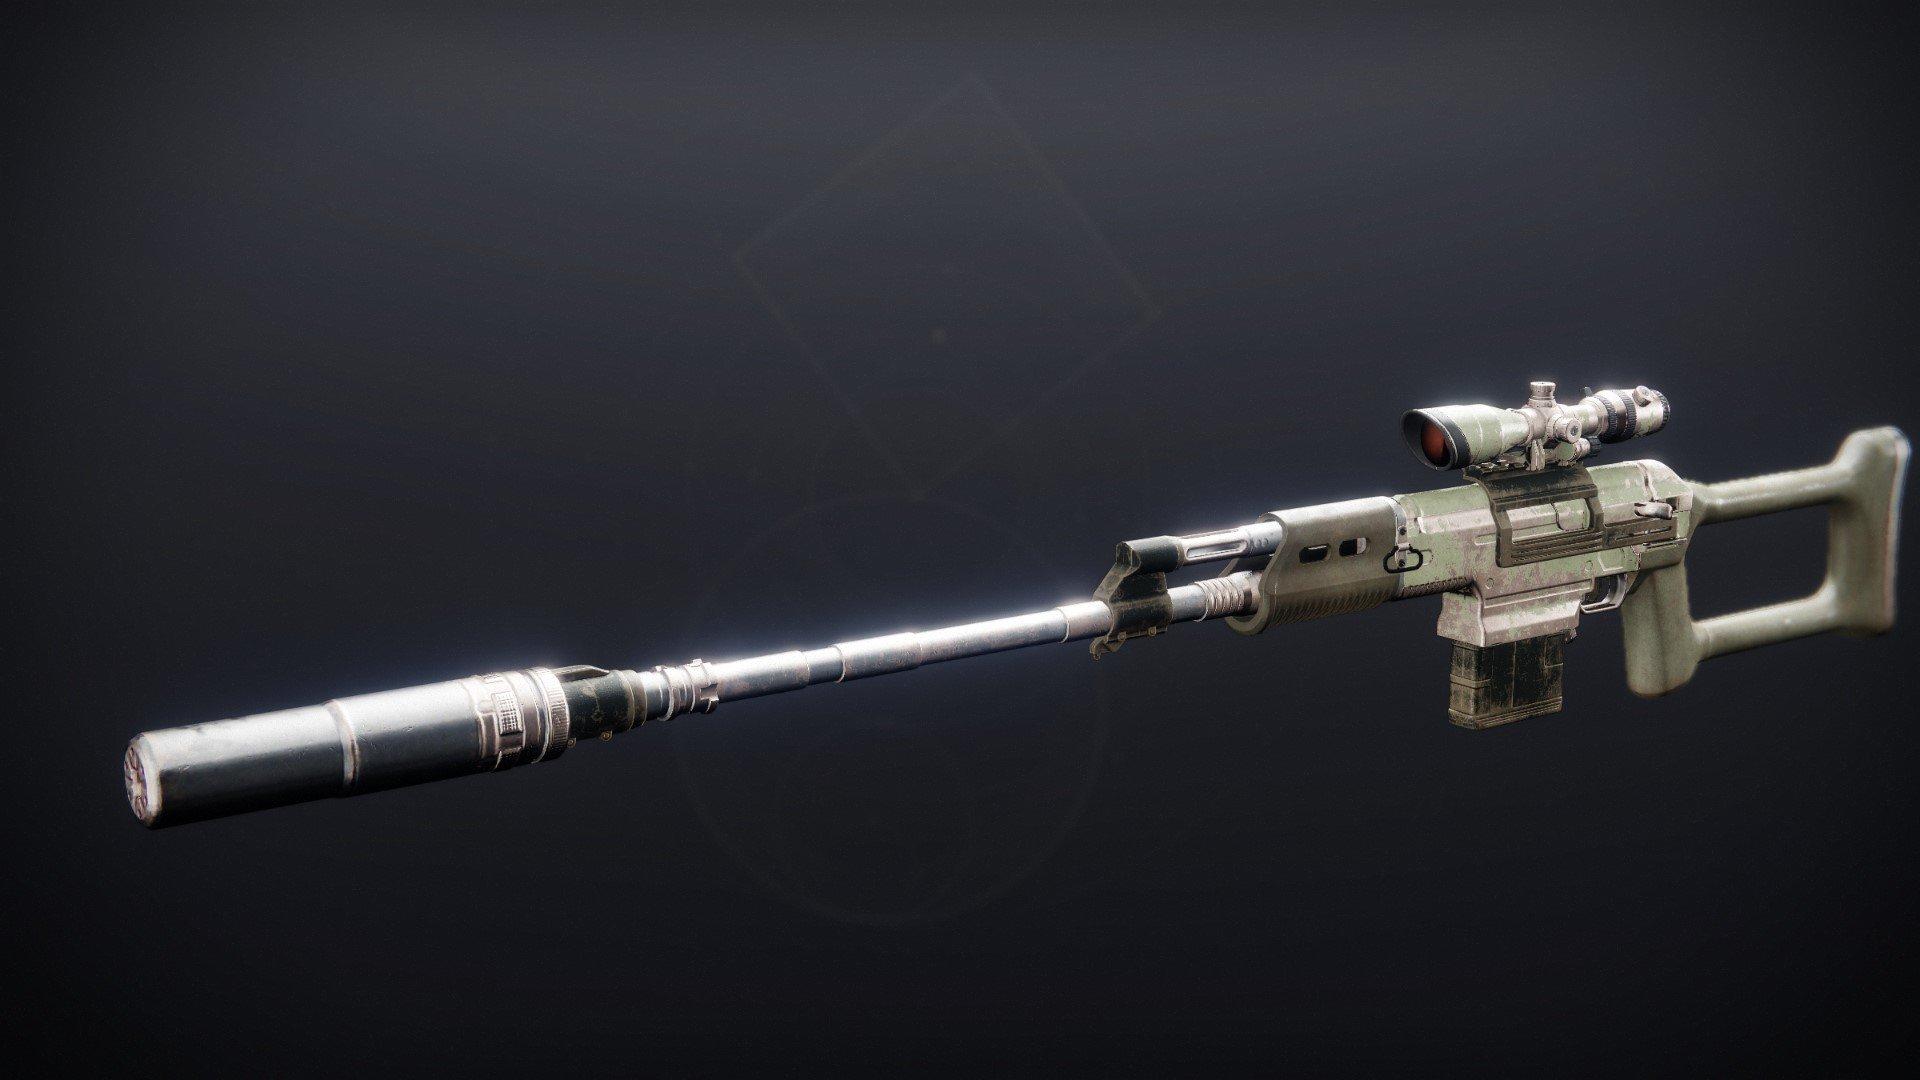 Shepherd's Watch - Sniper Rifle Destiny 2 Season Of The Lost Weapons